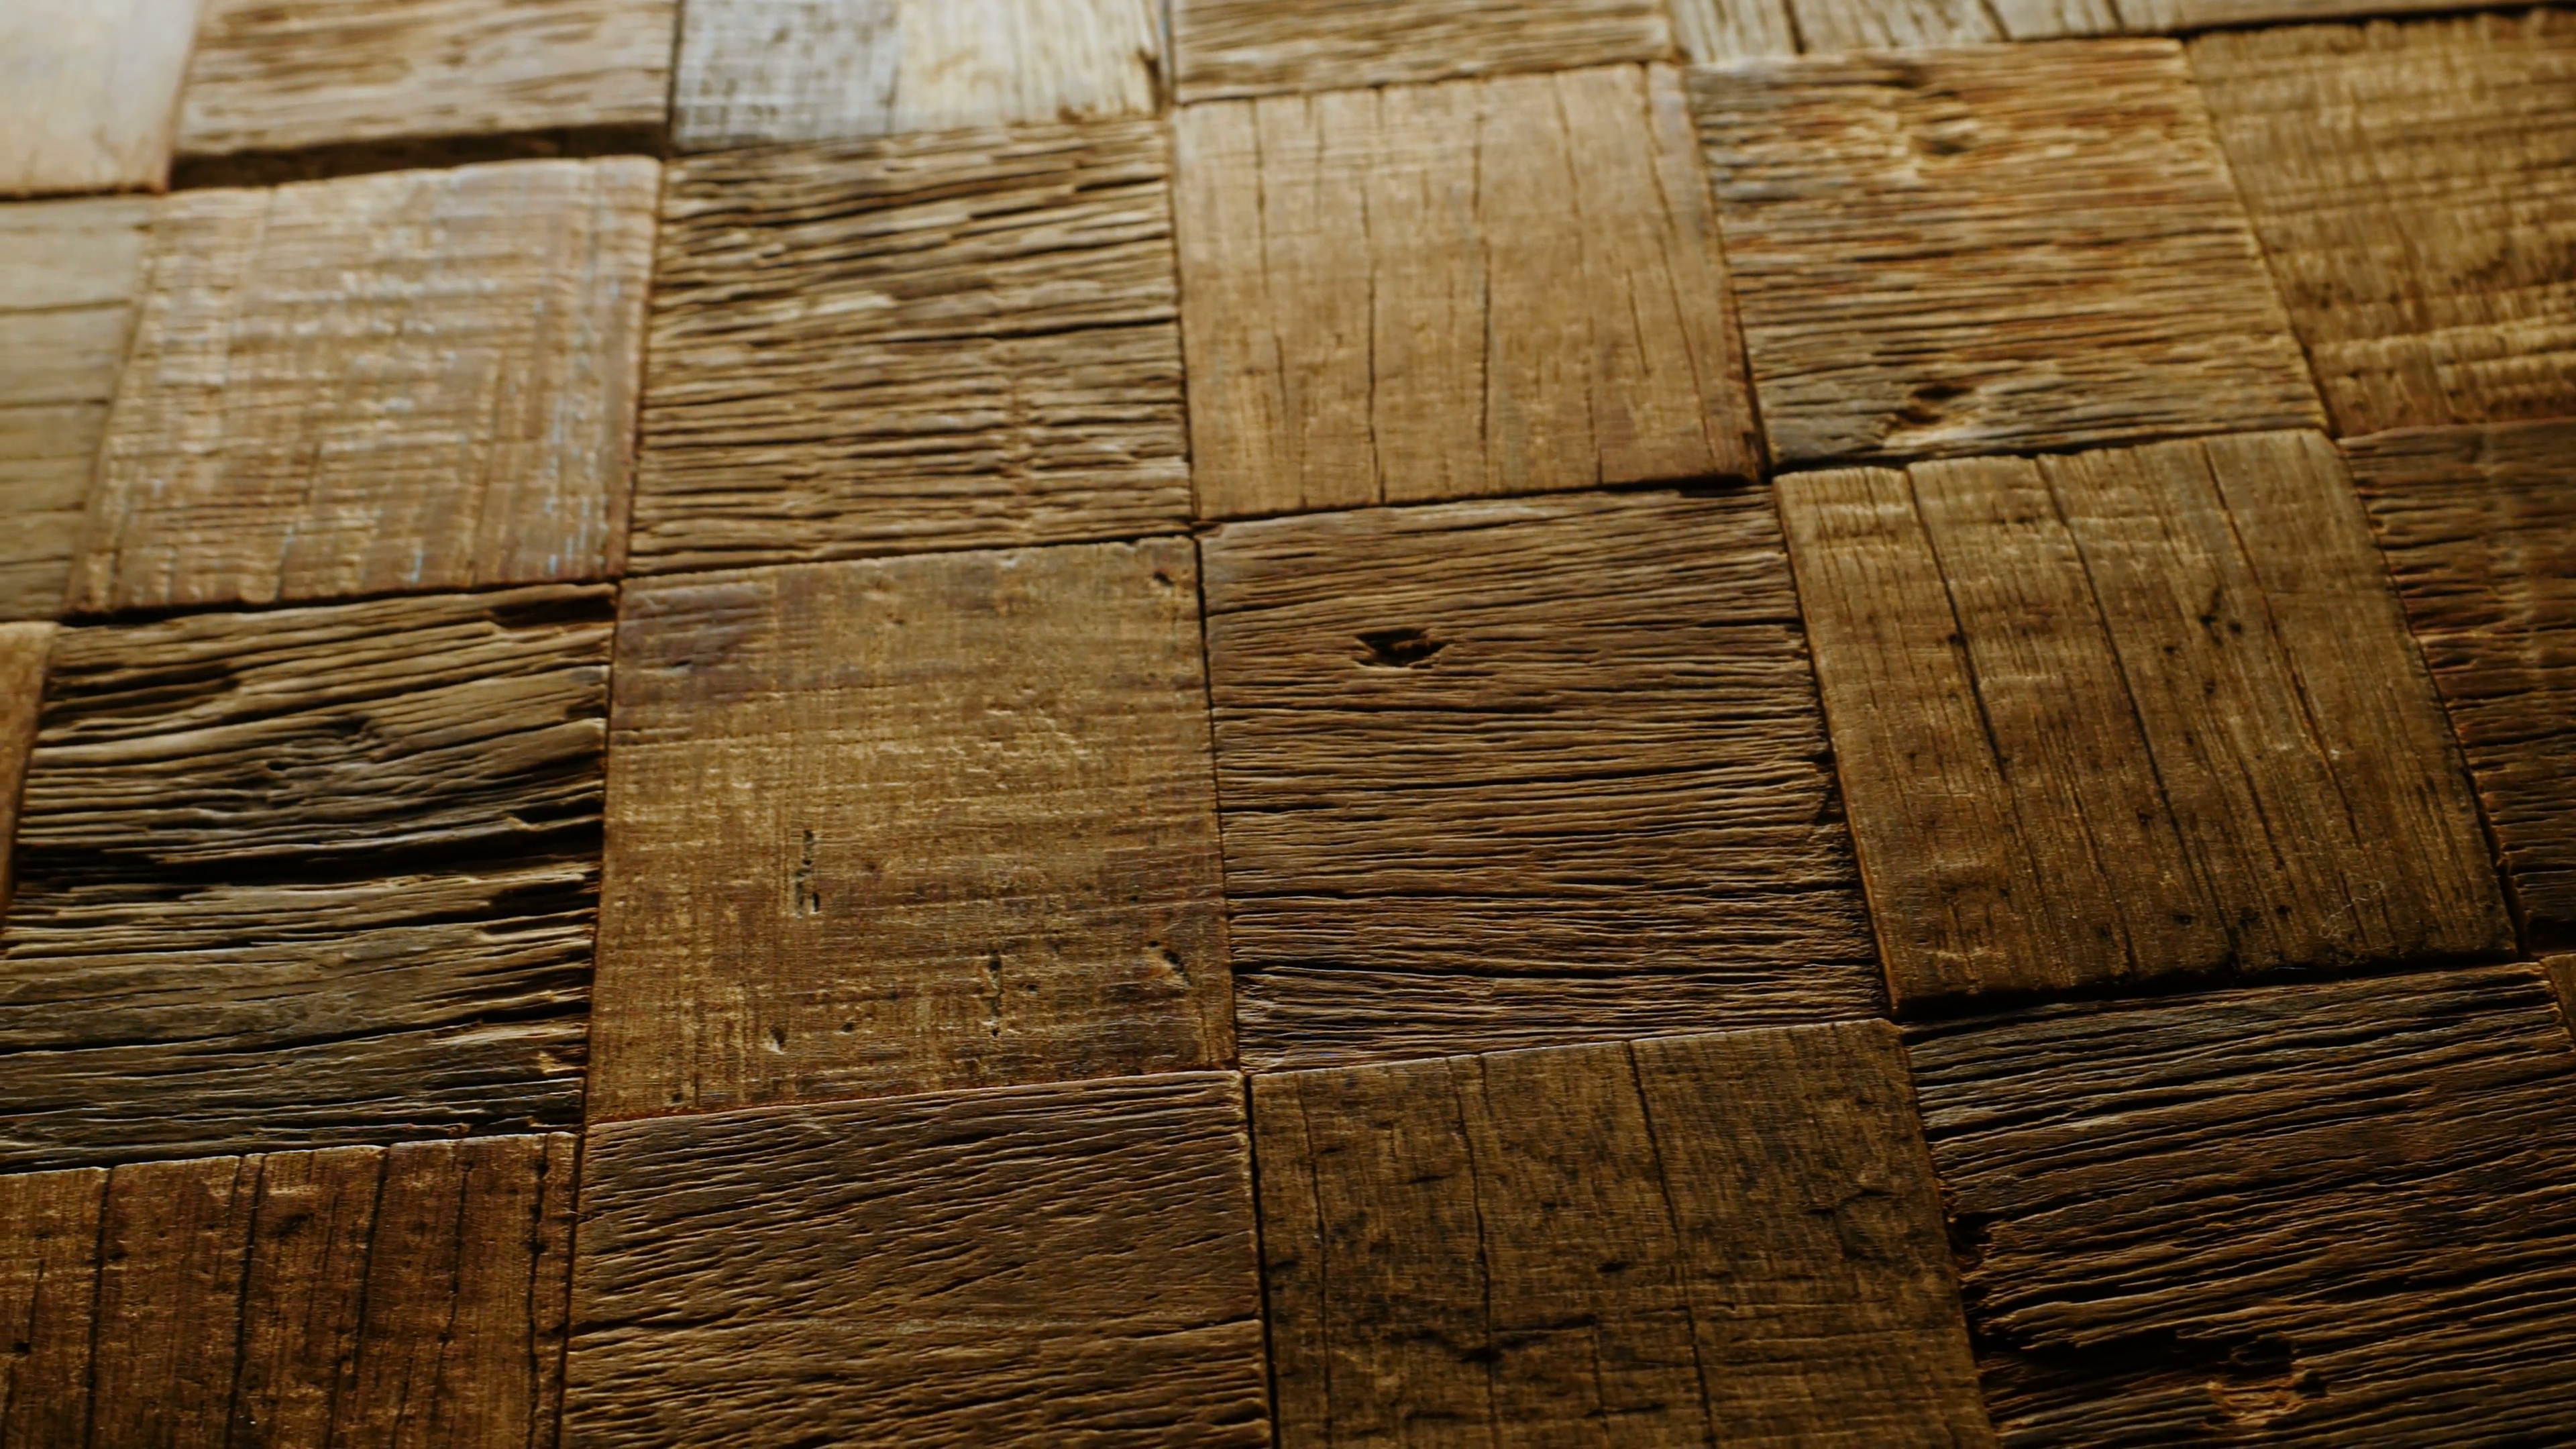 4K wood texture background Stock Video Footage - Videoblocks